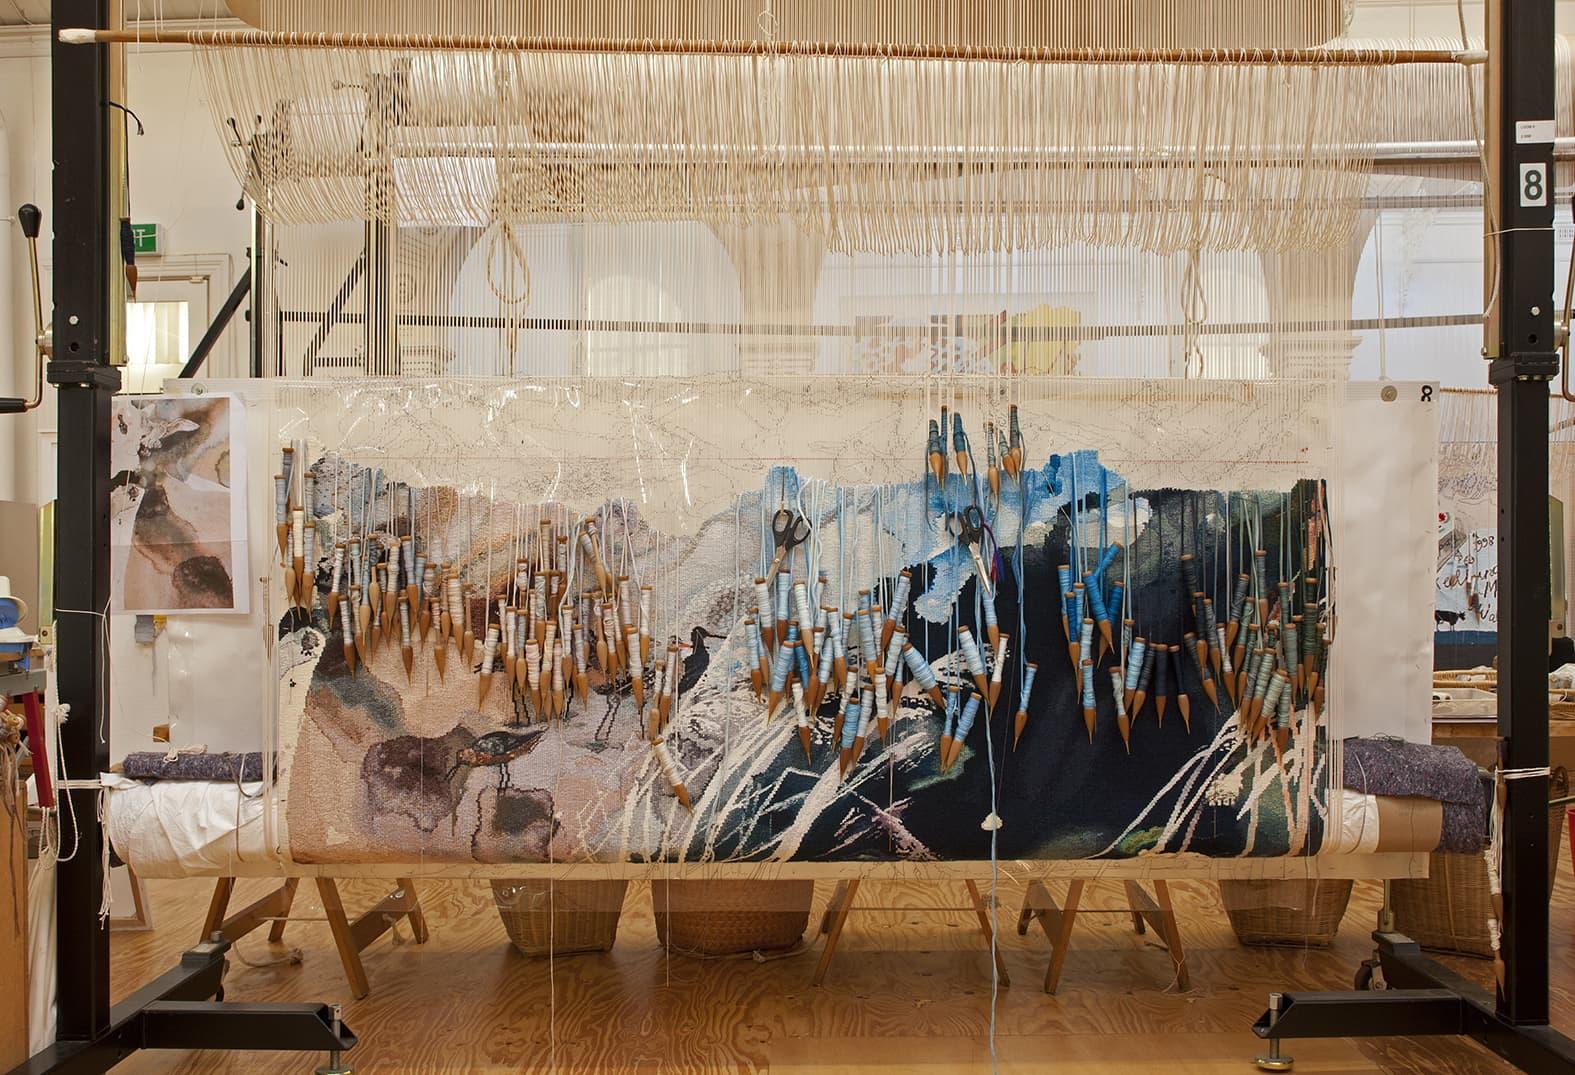 'Concerning the wading birds of the Warrnambool wetlands' 2012, designed by John Wolseley, woven by Chris Cochius, Pamela Joyce & Milena Paplinska, wool and cotton, 1.80 x 1.90m. Photograph: Viki Petherbridge.